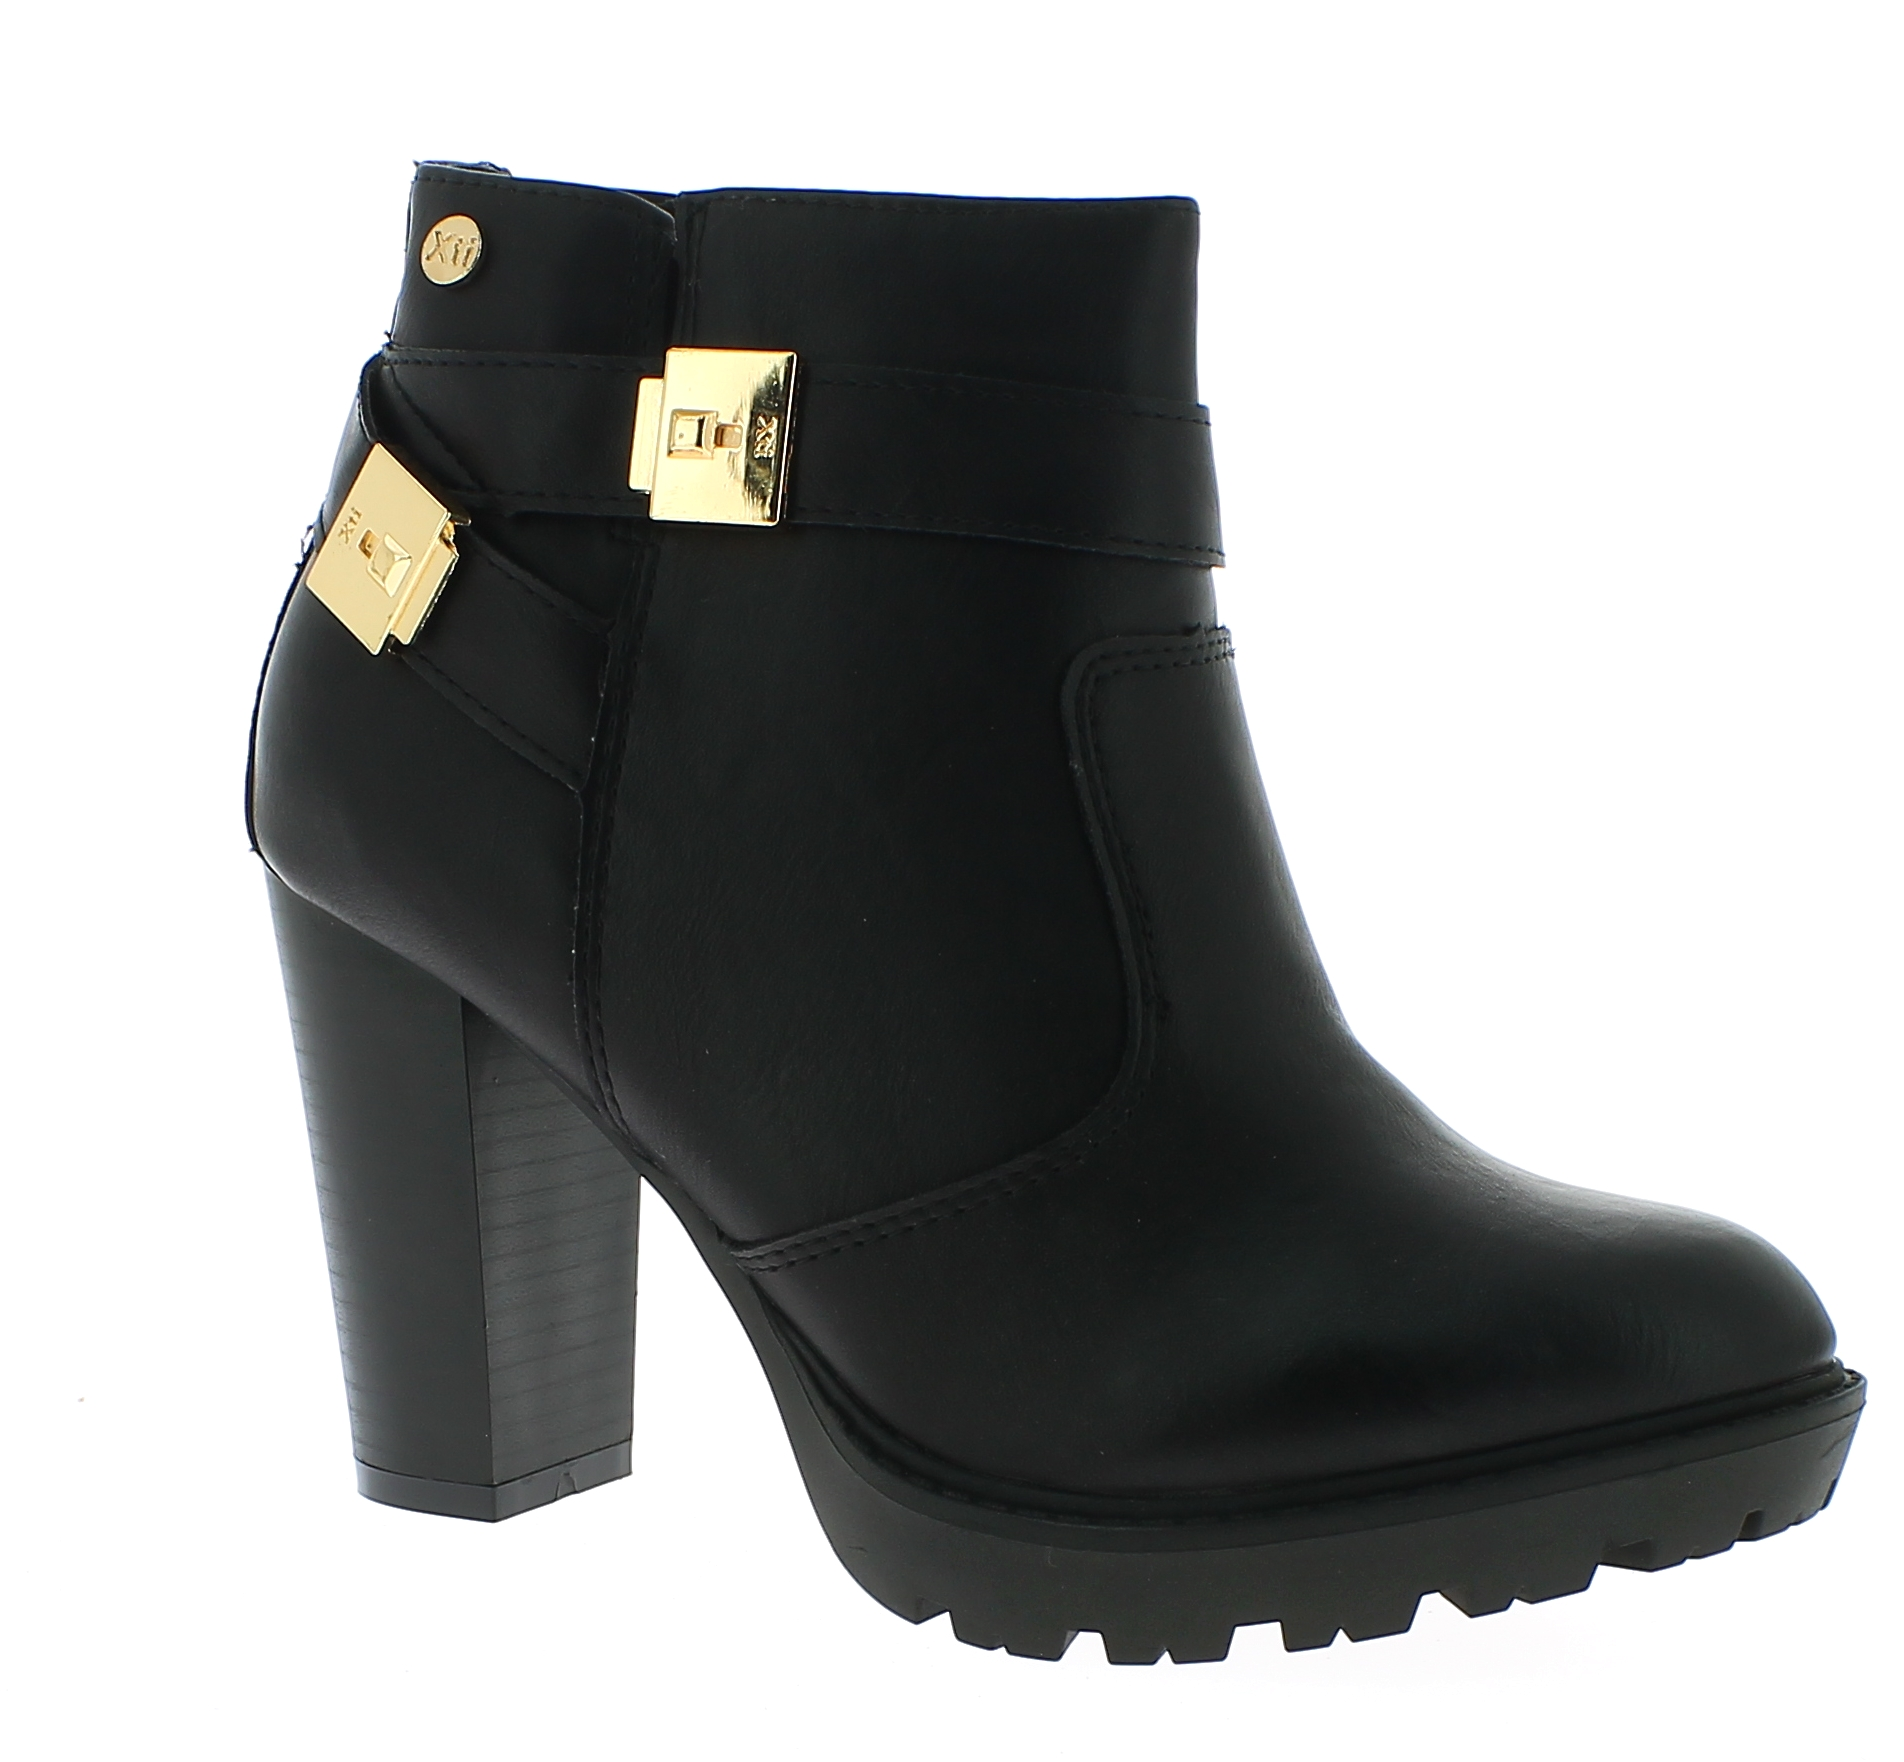 XTI Γυναικείο Μποτάκι 46055 Μαύρο - IqShoes - 46055 BLACK-black-37/1/15/27 παπούτσια  γυναικεία μποτάκια